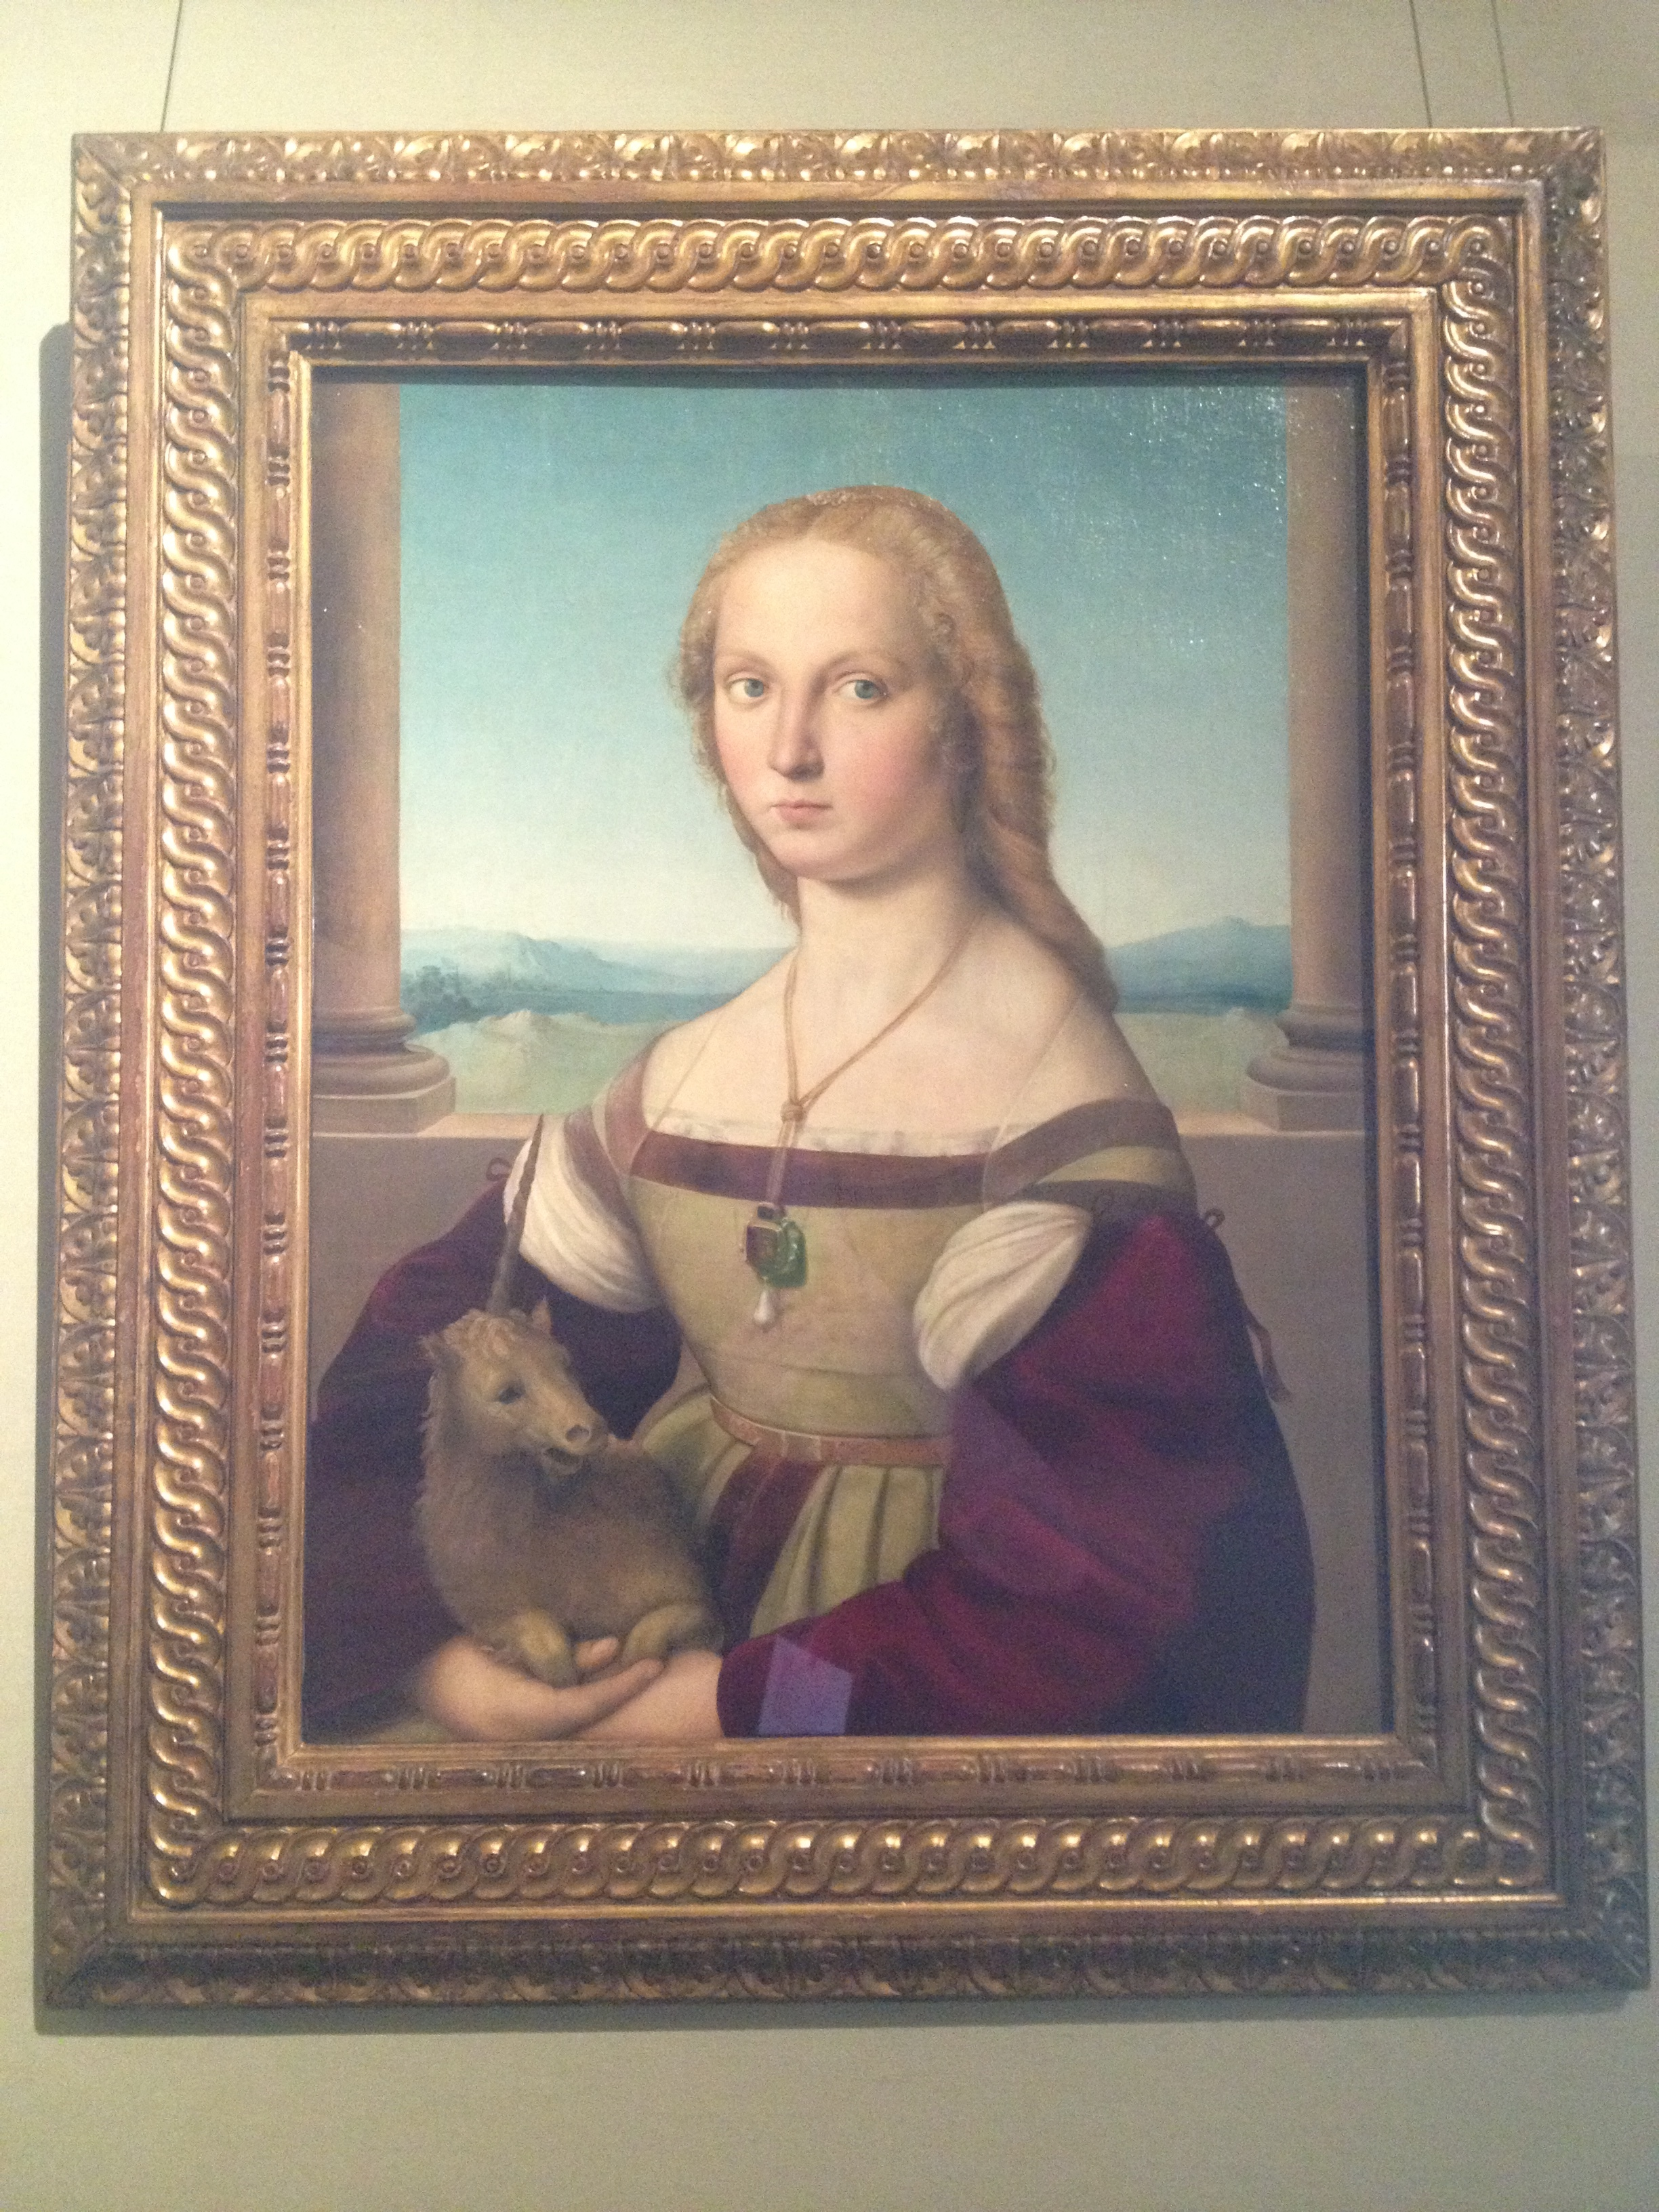 Young Woman With Unicorn Rafael Sanzio 1506 OIl on canvas on wood